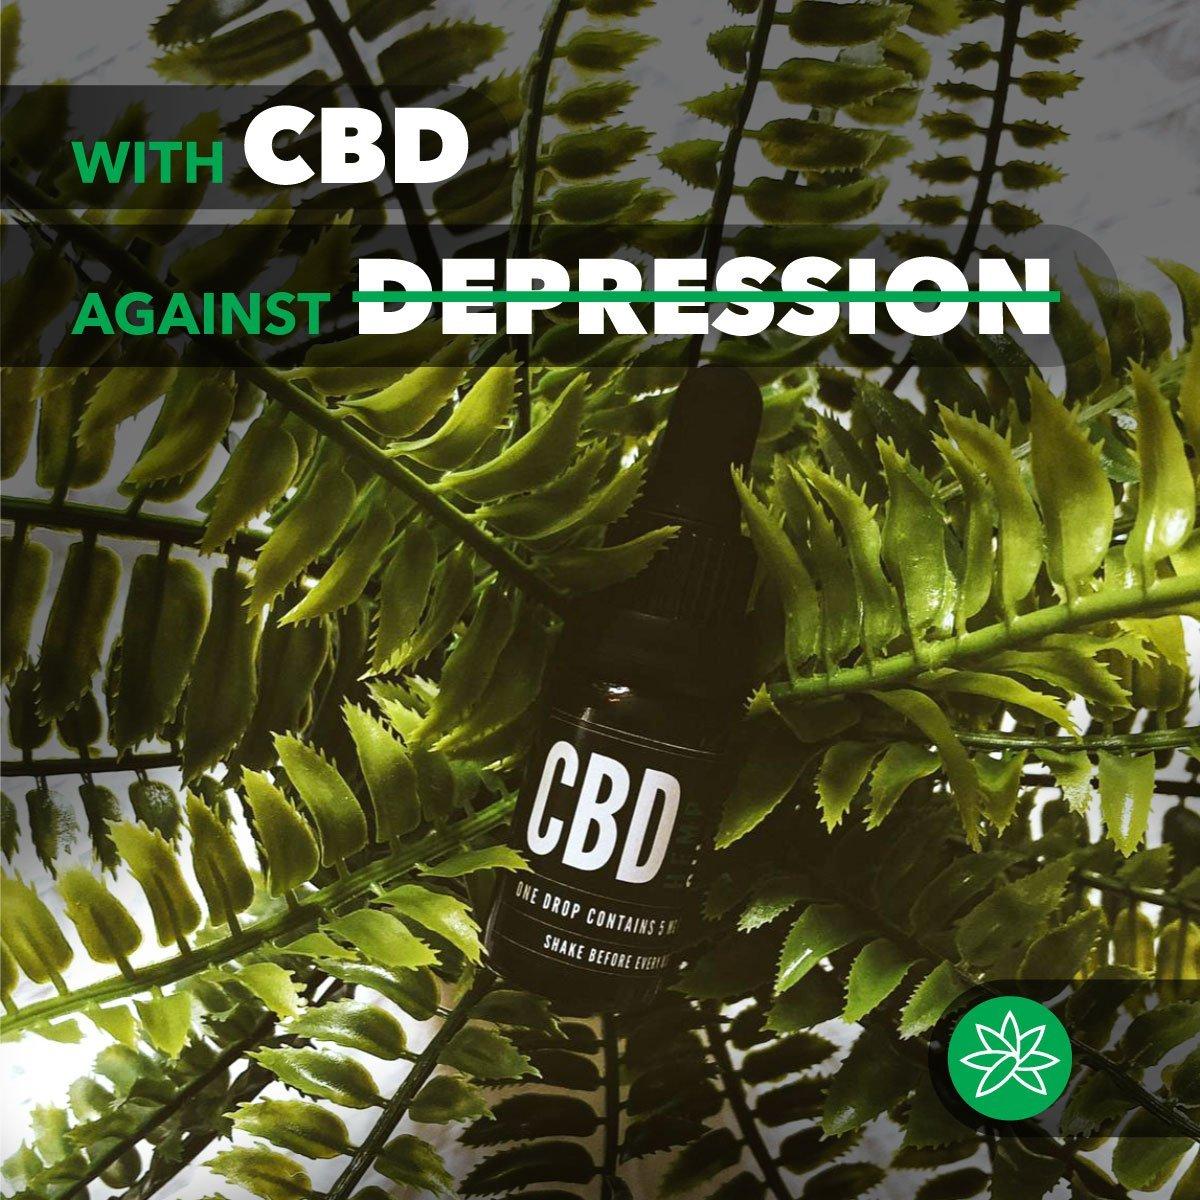 With CBD against depression